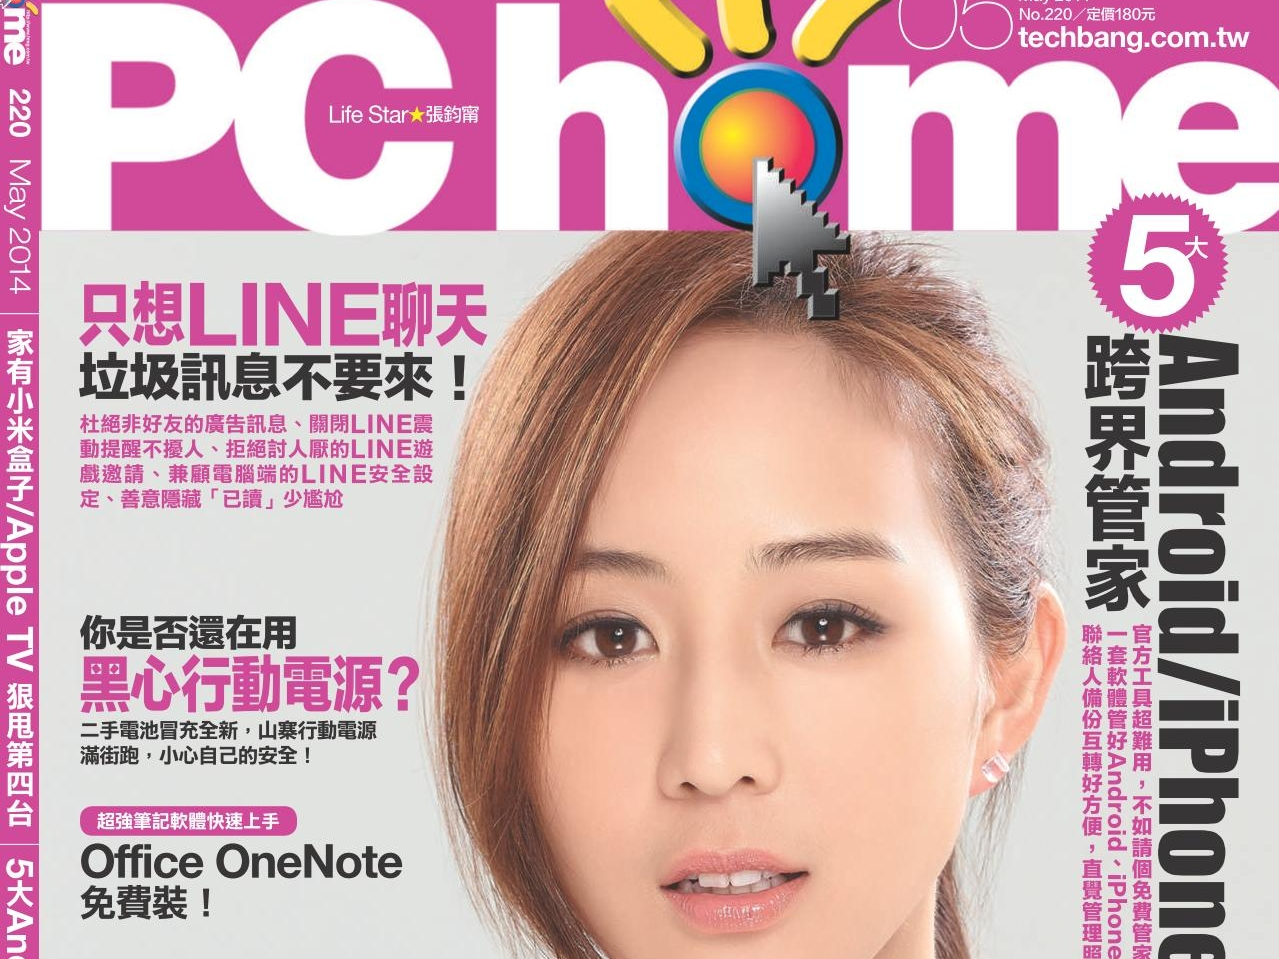 PC home 220期:5月1日出刊、甩掉第四台,為電視選個好盒子